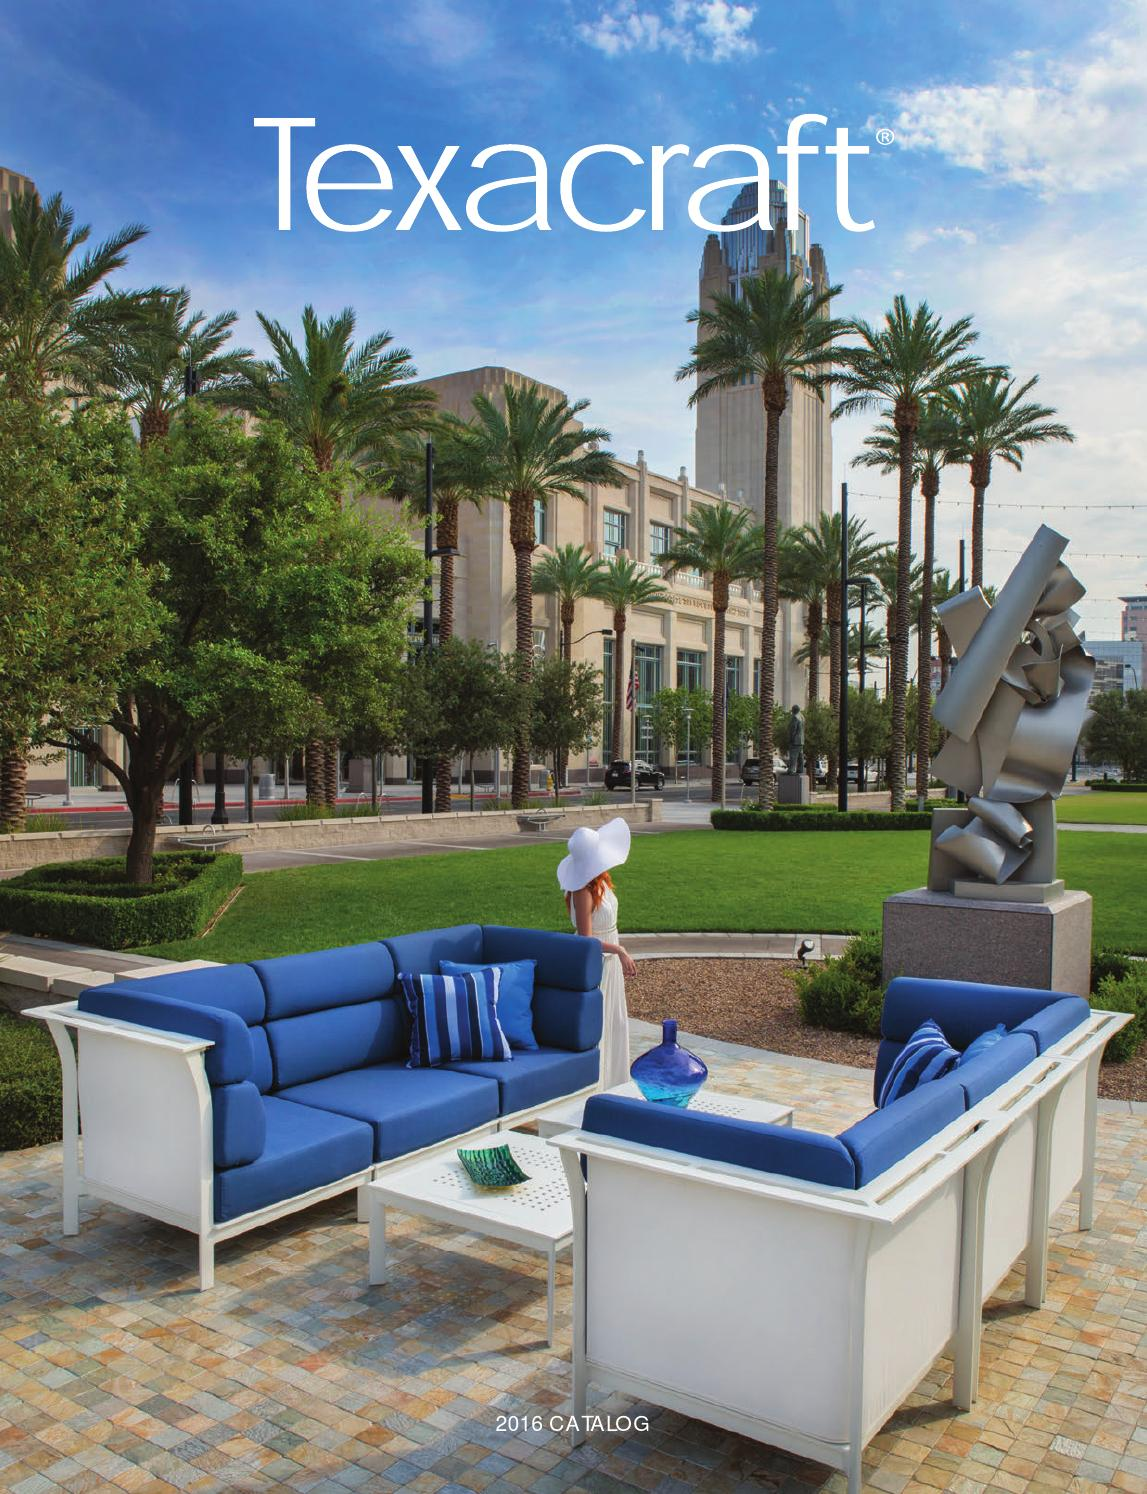 2016 Texacraft Catalog By Winston Furniture   Issuu